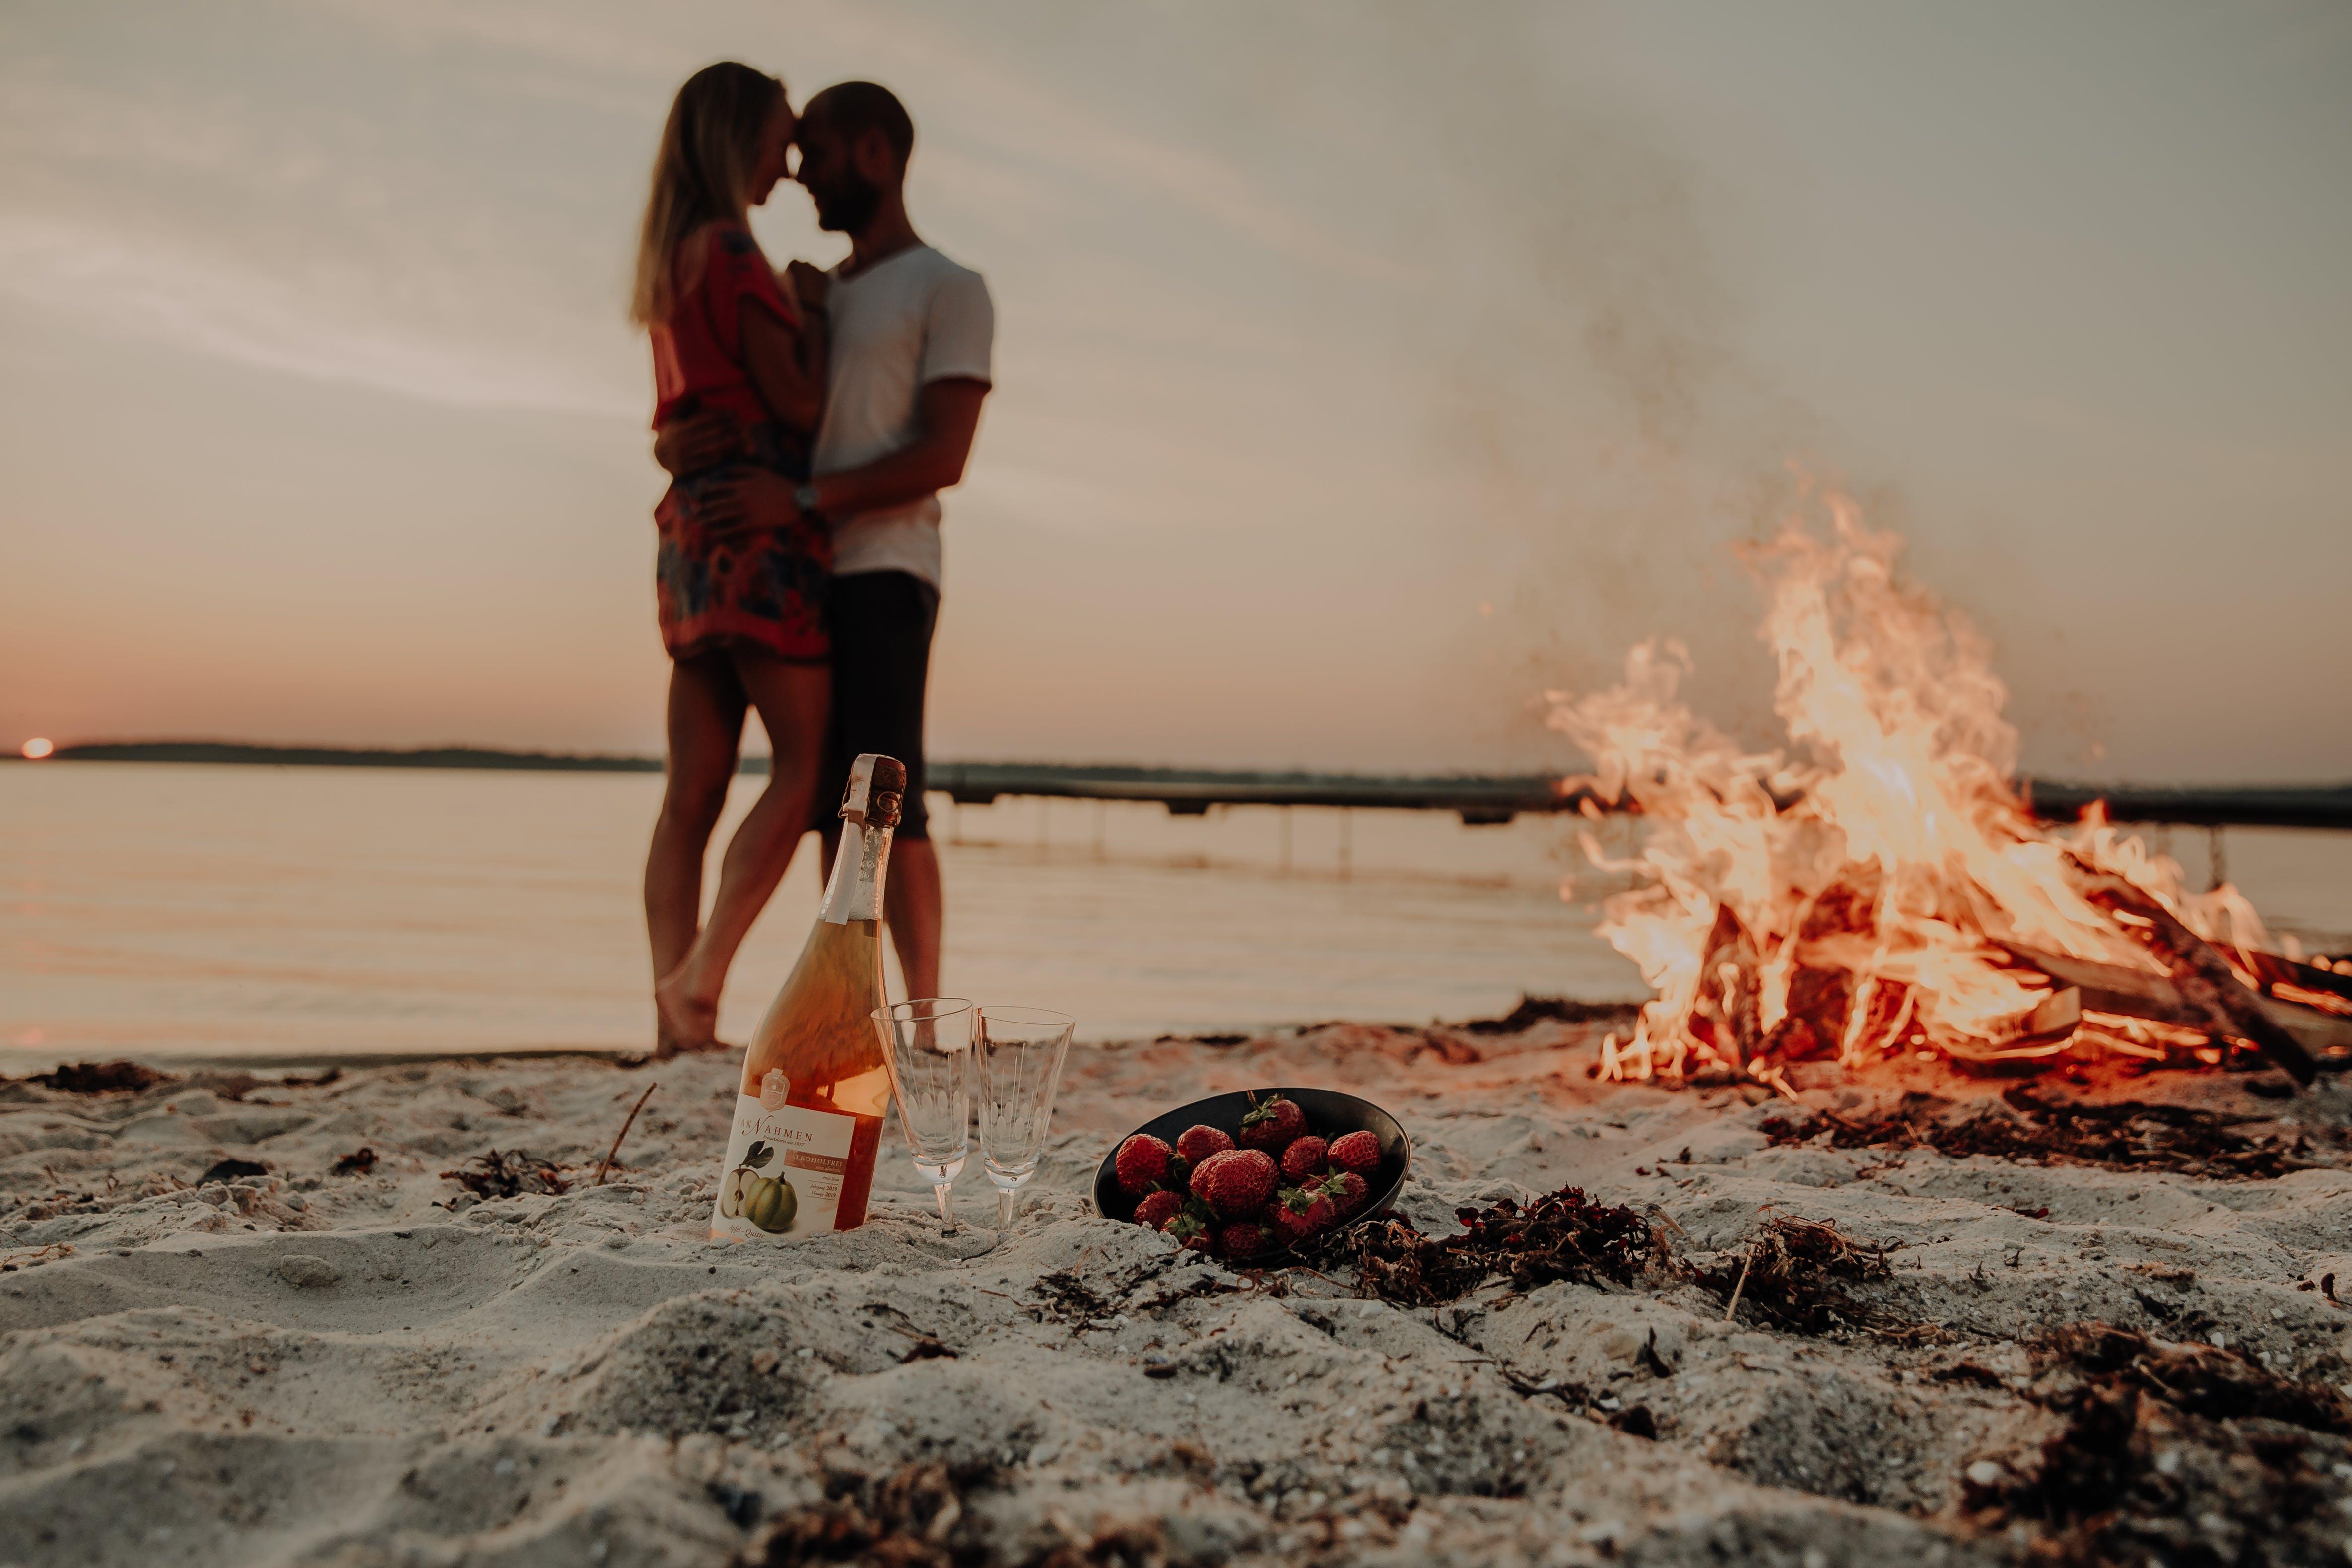 romantic couple on beach with bonfire